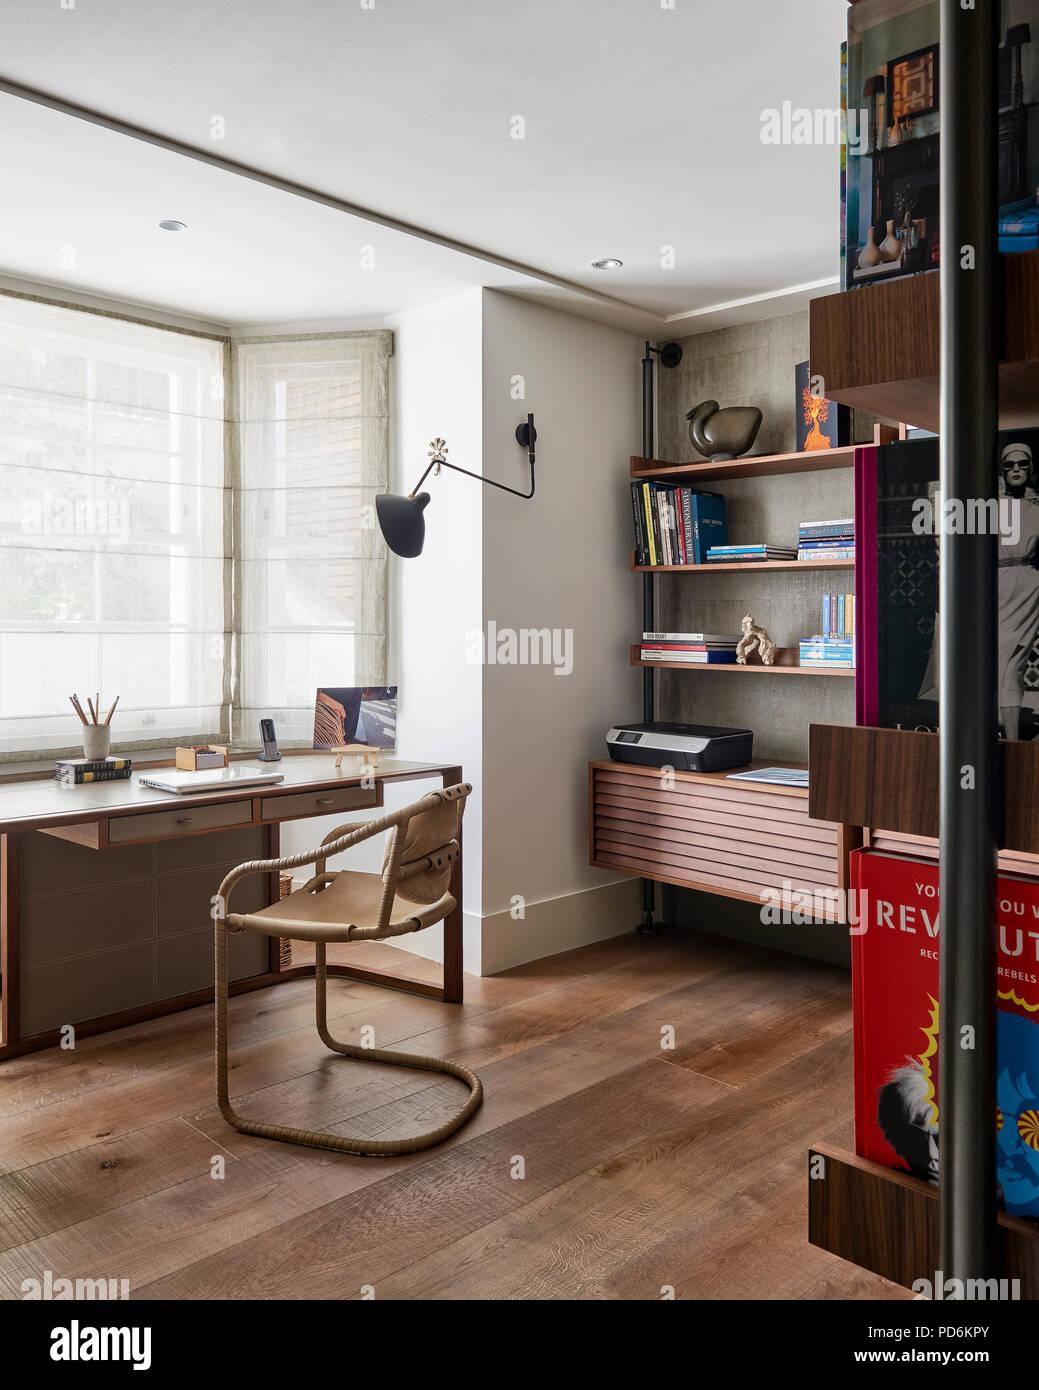 Deska nd chair in window with bookshelf - Stock Image